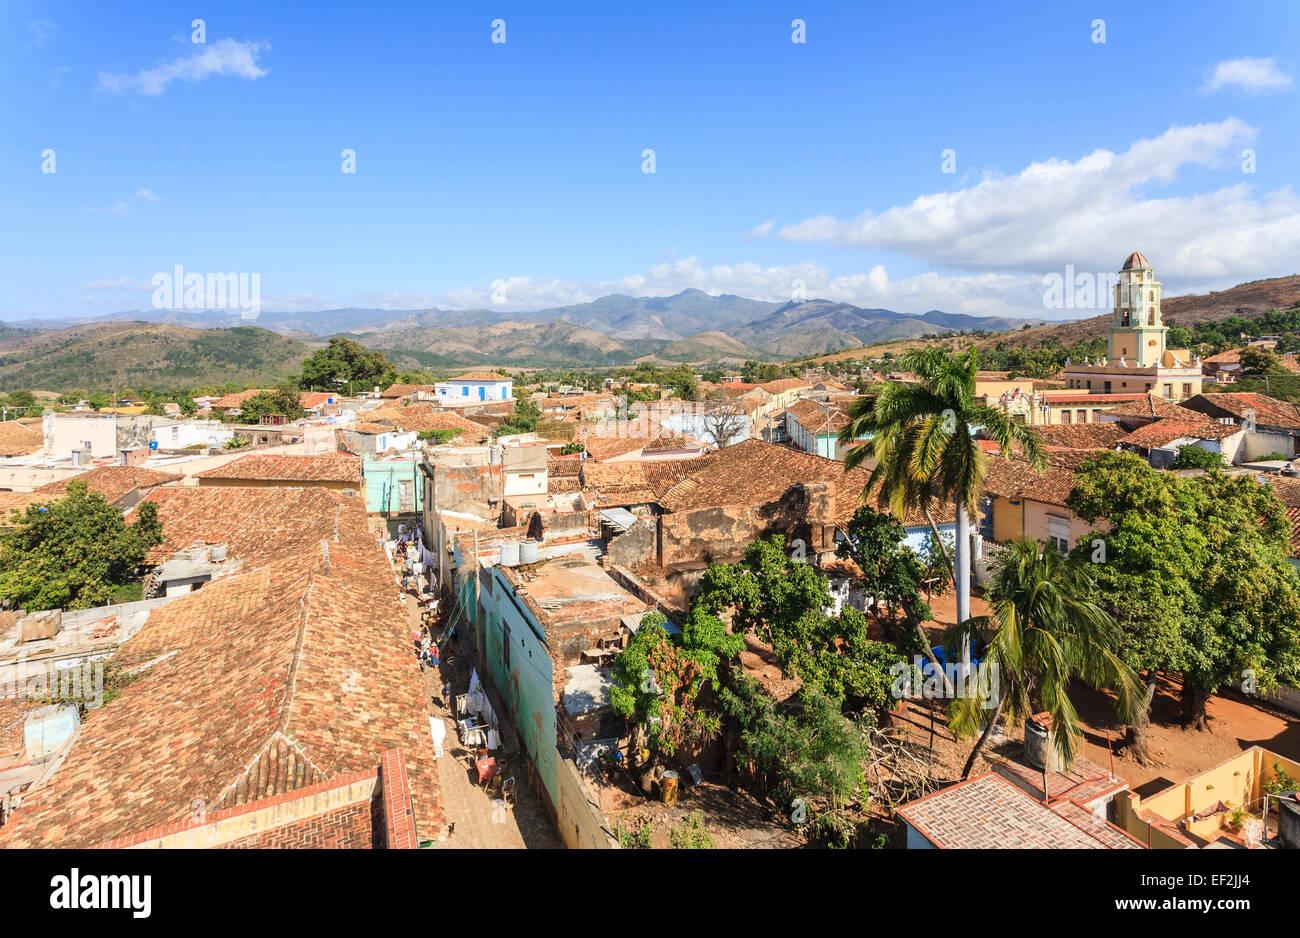 Panoramic terracotta tiled rooftop view over Trinidad, Cuba with Iglesia Parroquial de la Santísima Trinidad (Church Stock Photo